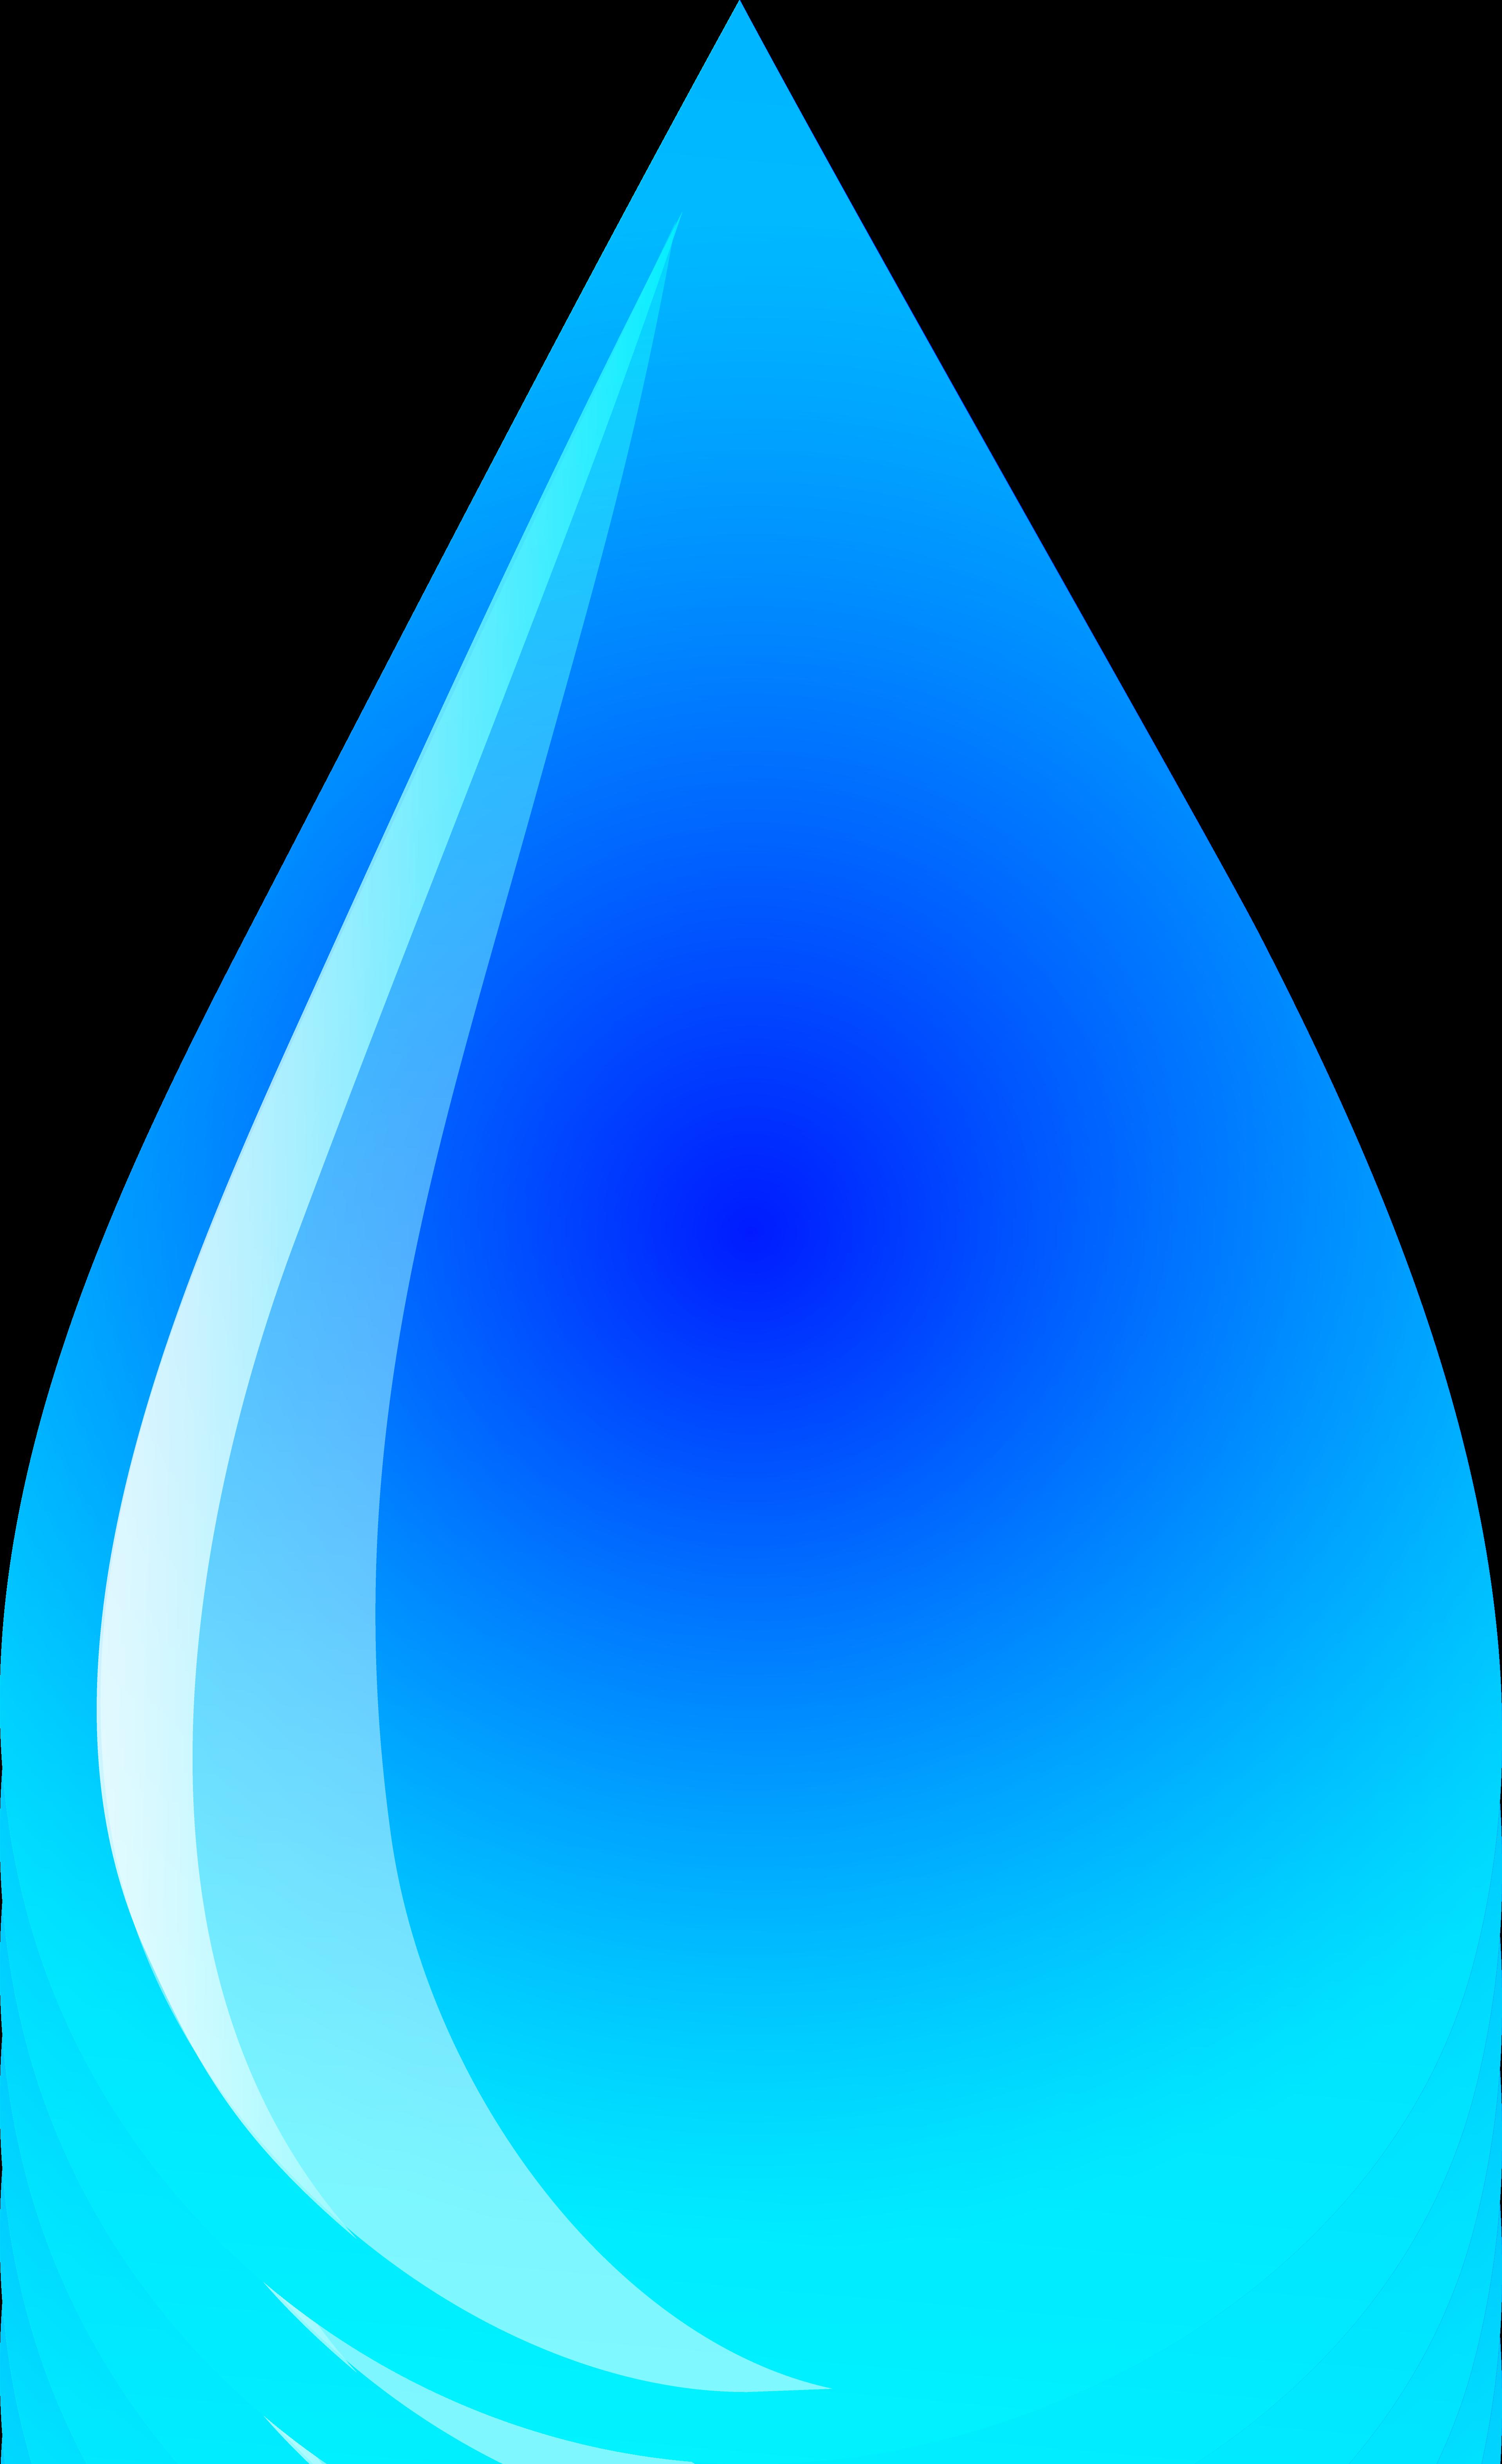 Blue Water Droplet Logo - Free Clip Art